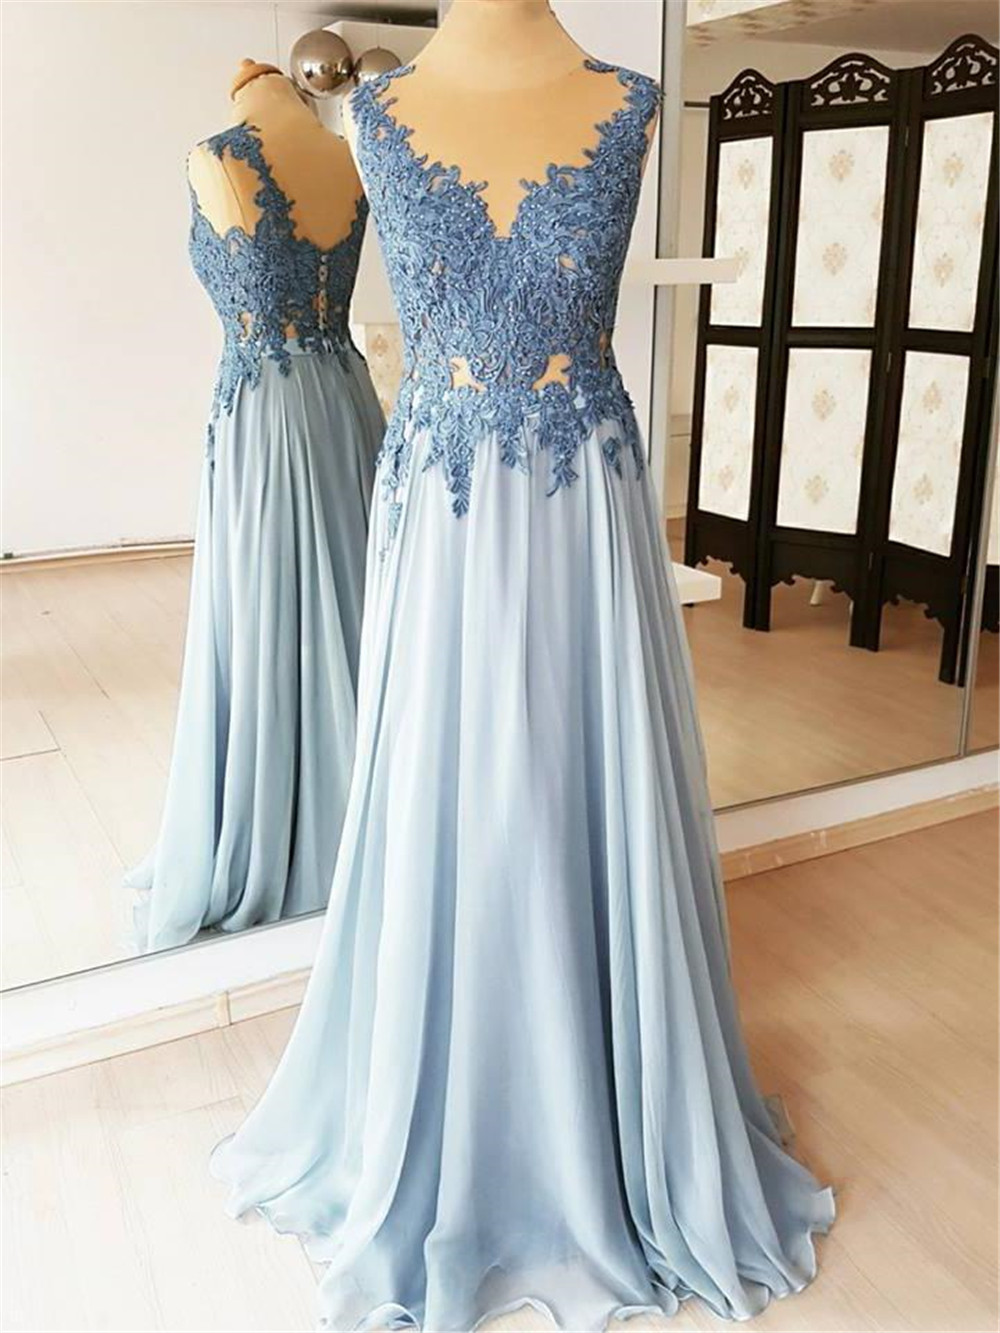 High Quality Light Blue Chiffon   Prom     Dresses   Lace Appliques Illusion A Line Elegant Long Formal   Dress   2019 Vestido De Festa